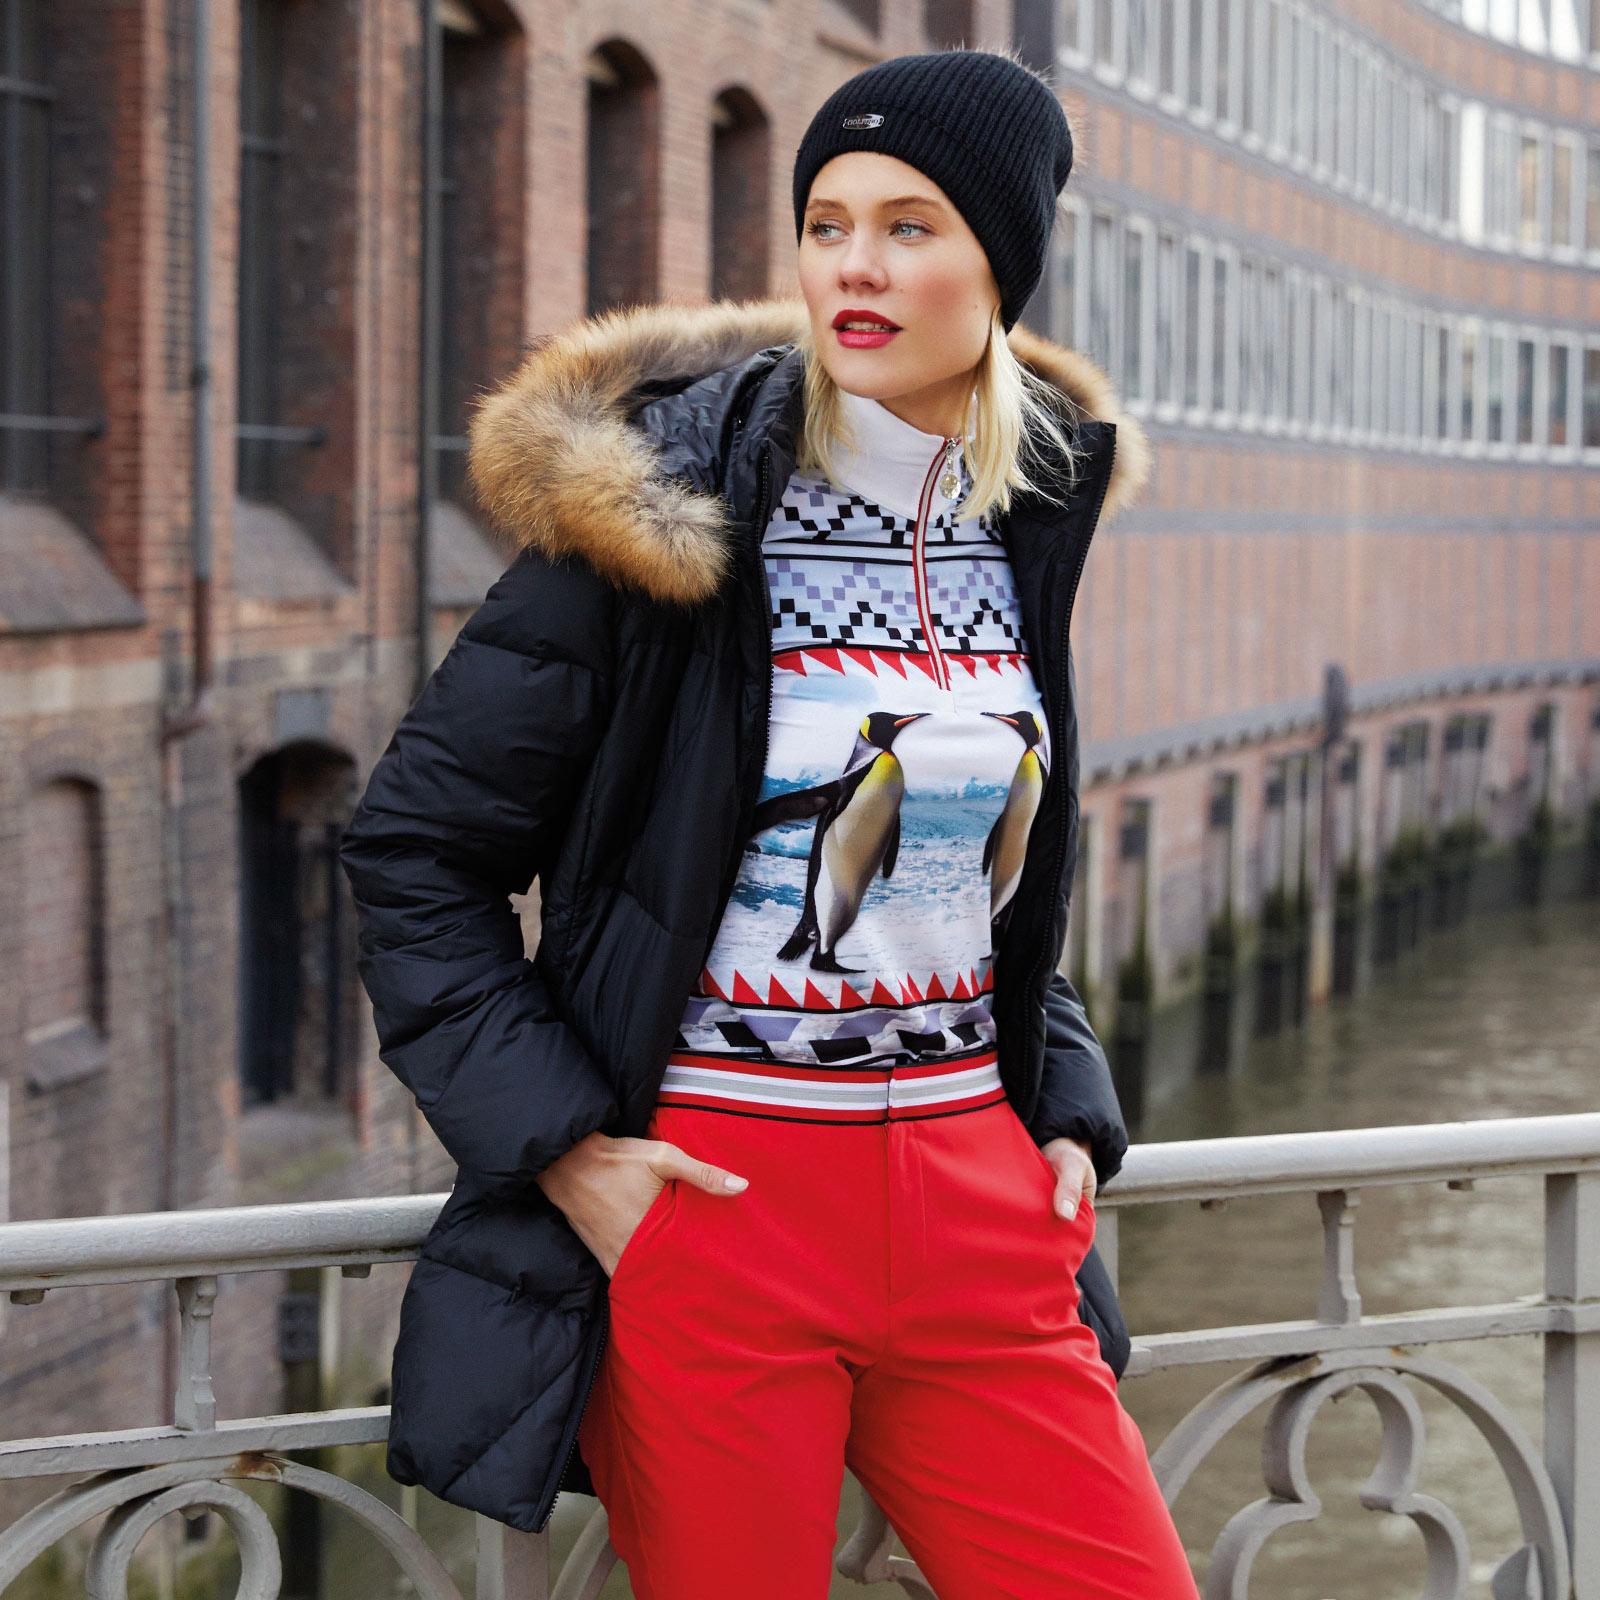 Arctic Print Pinguin Langarm Shirt Damen mit Stretchfunktion